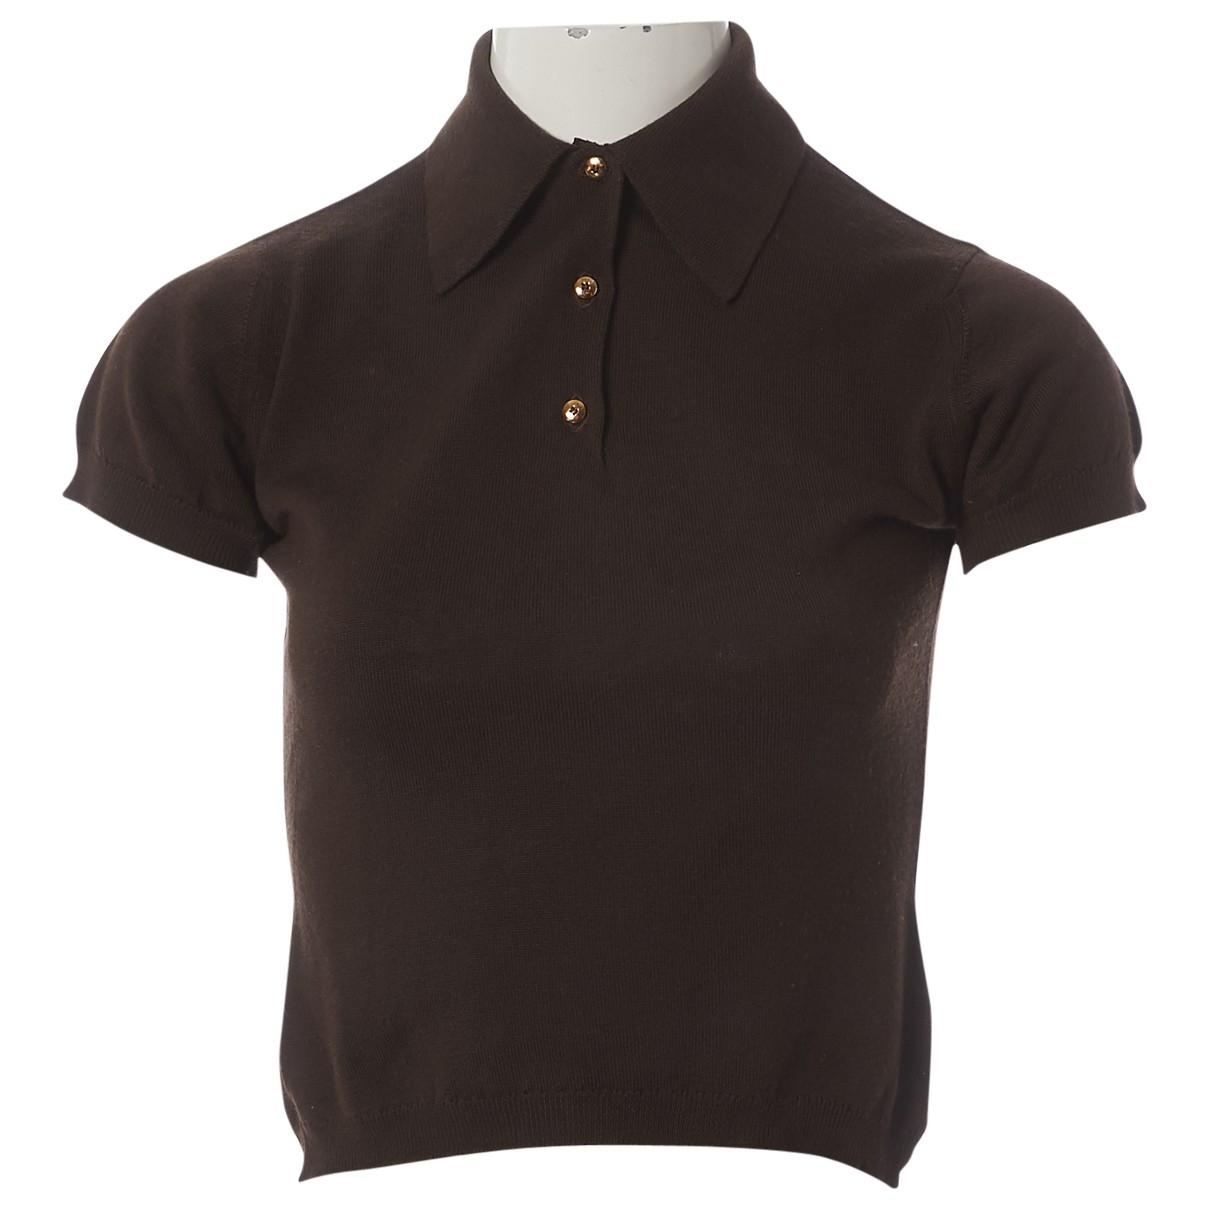 Dior \N Brown Wool Knitwear for Women S International